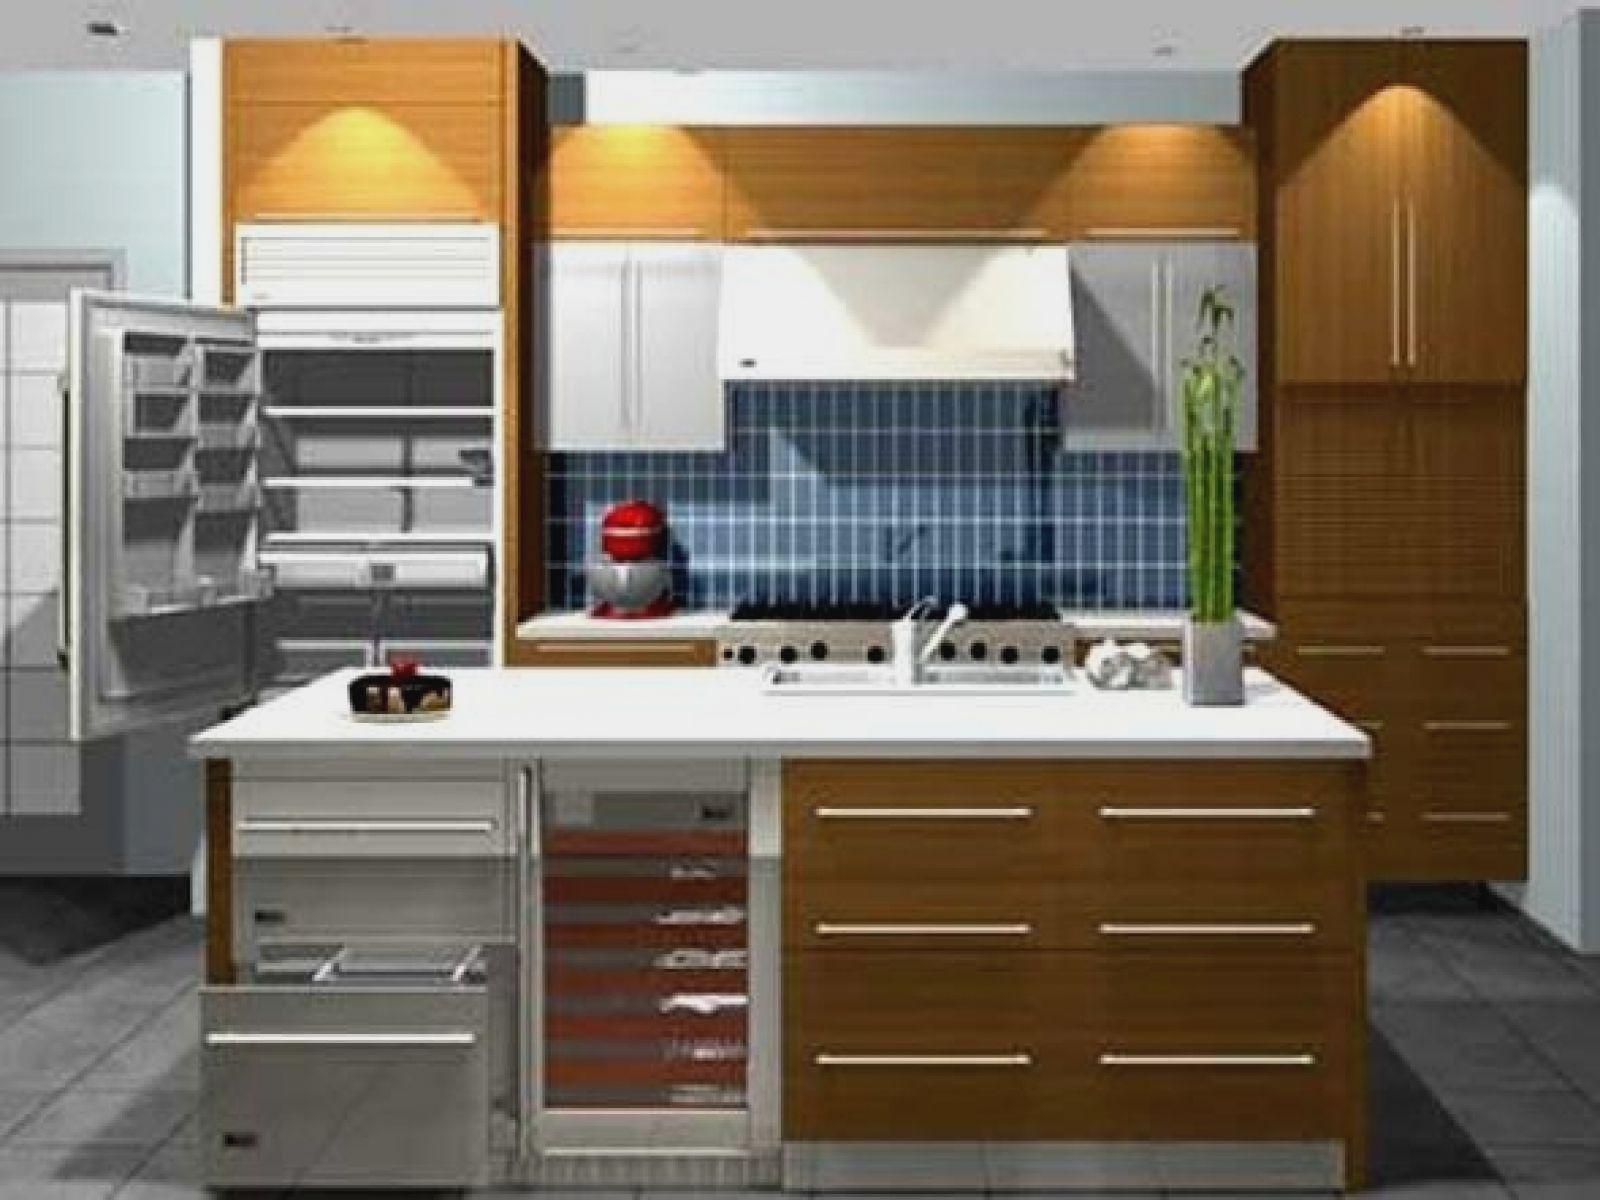 Uncategorized Kitchen Design On Line kitchen design on line httptoples xyz12201607kitchen xyz12201607kitchen